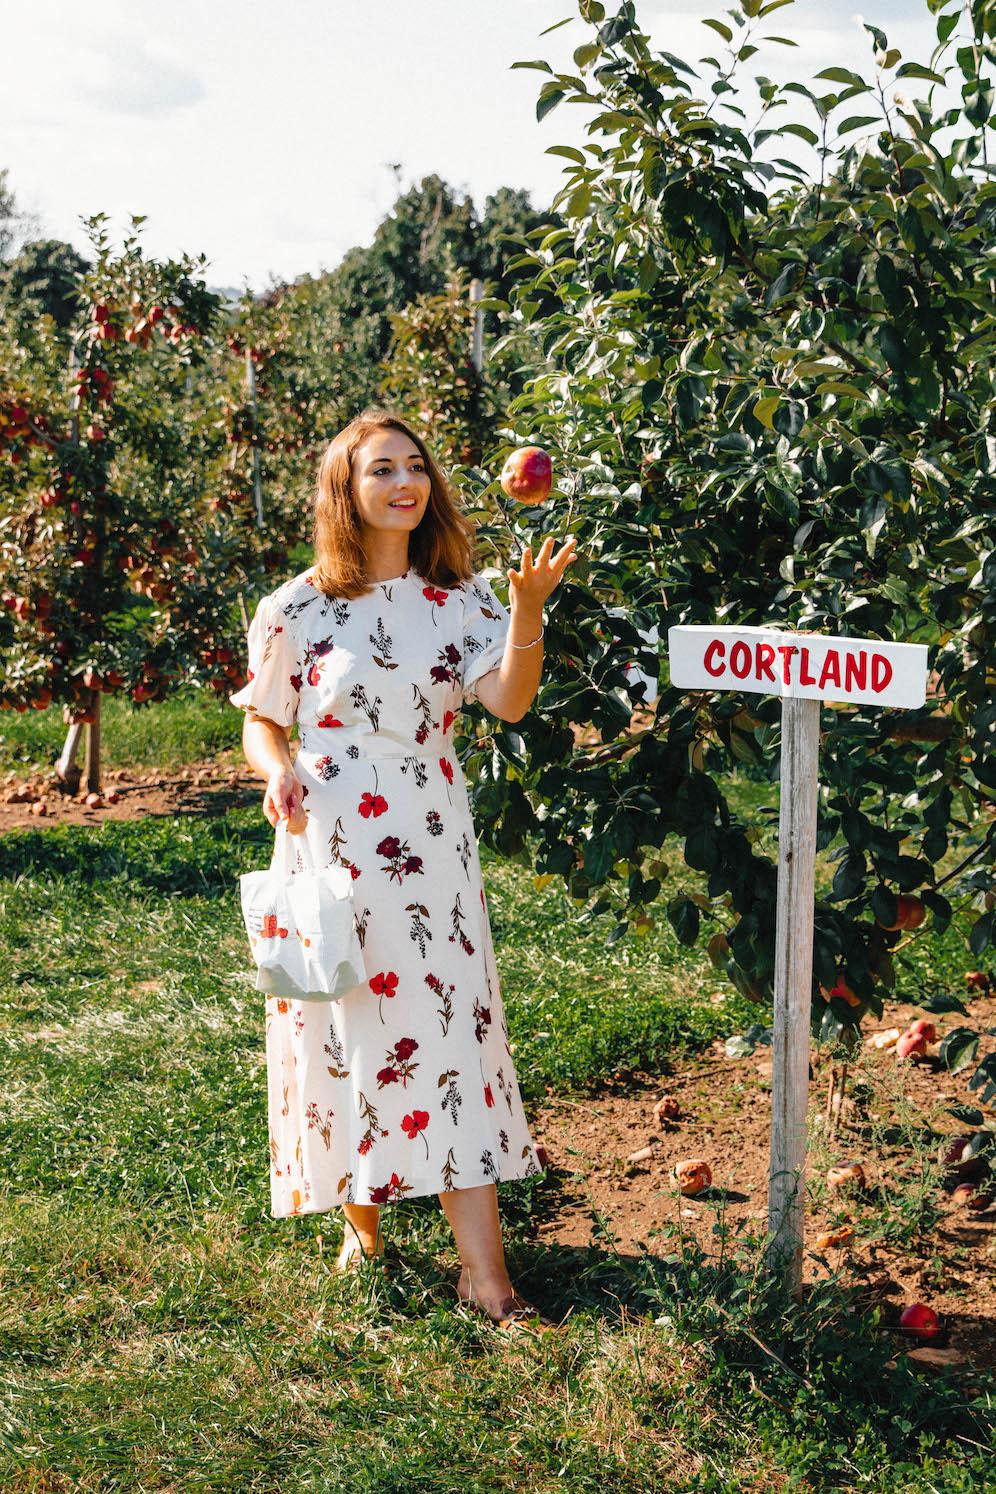 Apple-Picking-in-Fairfield-County-Connecticut-The-Coastal-Confidence-by-Aubrey-Yandow-1635.jpg